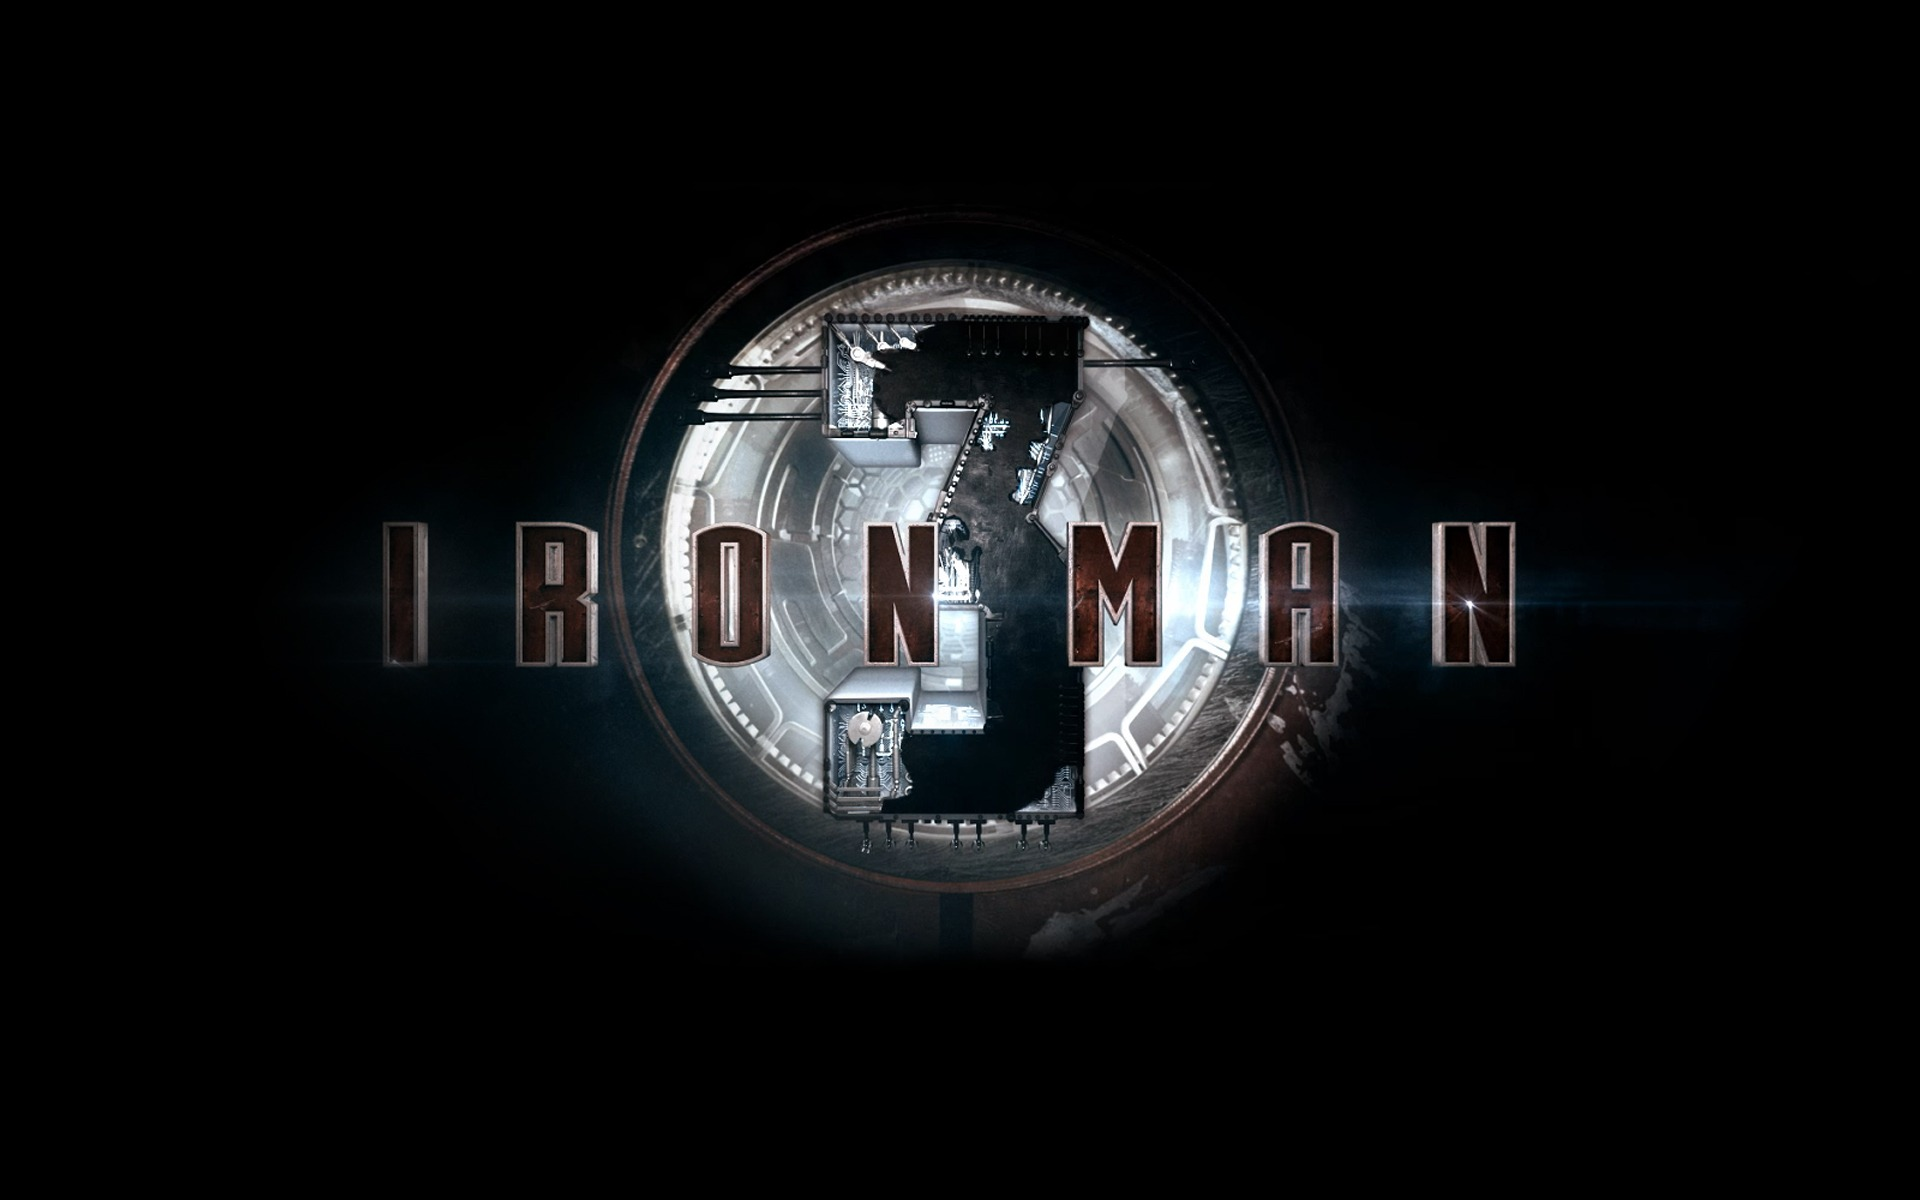 Iron Man 3 Movie Hd Desktop Wallpaper